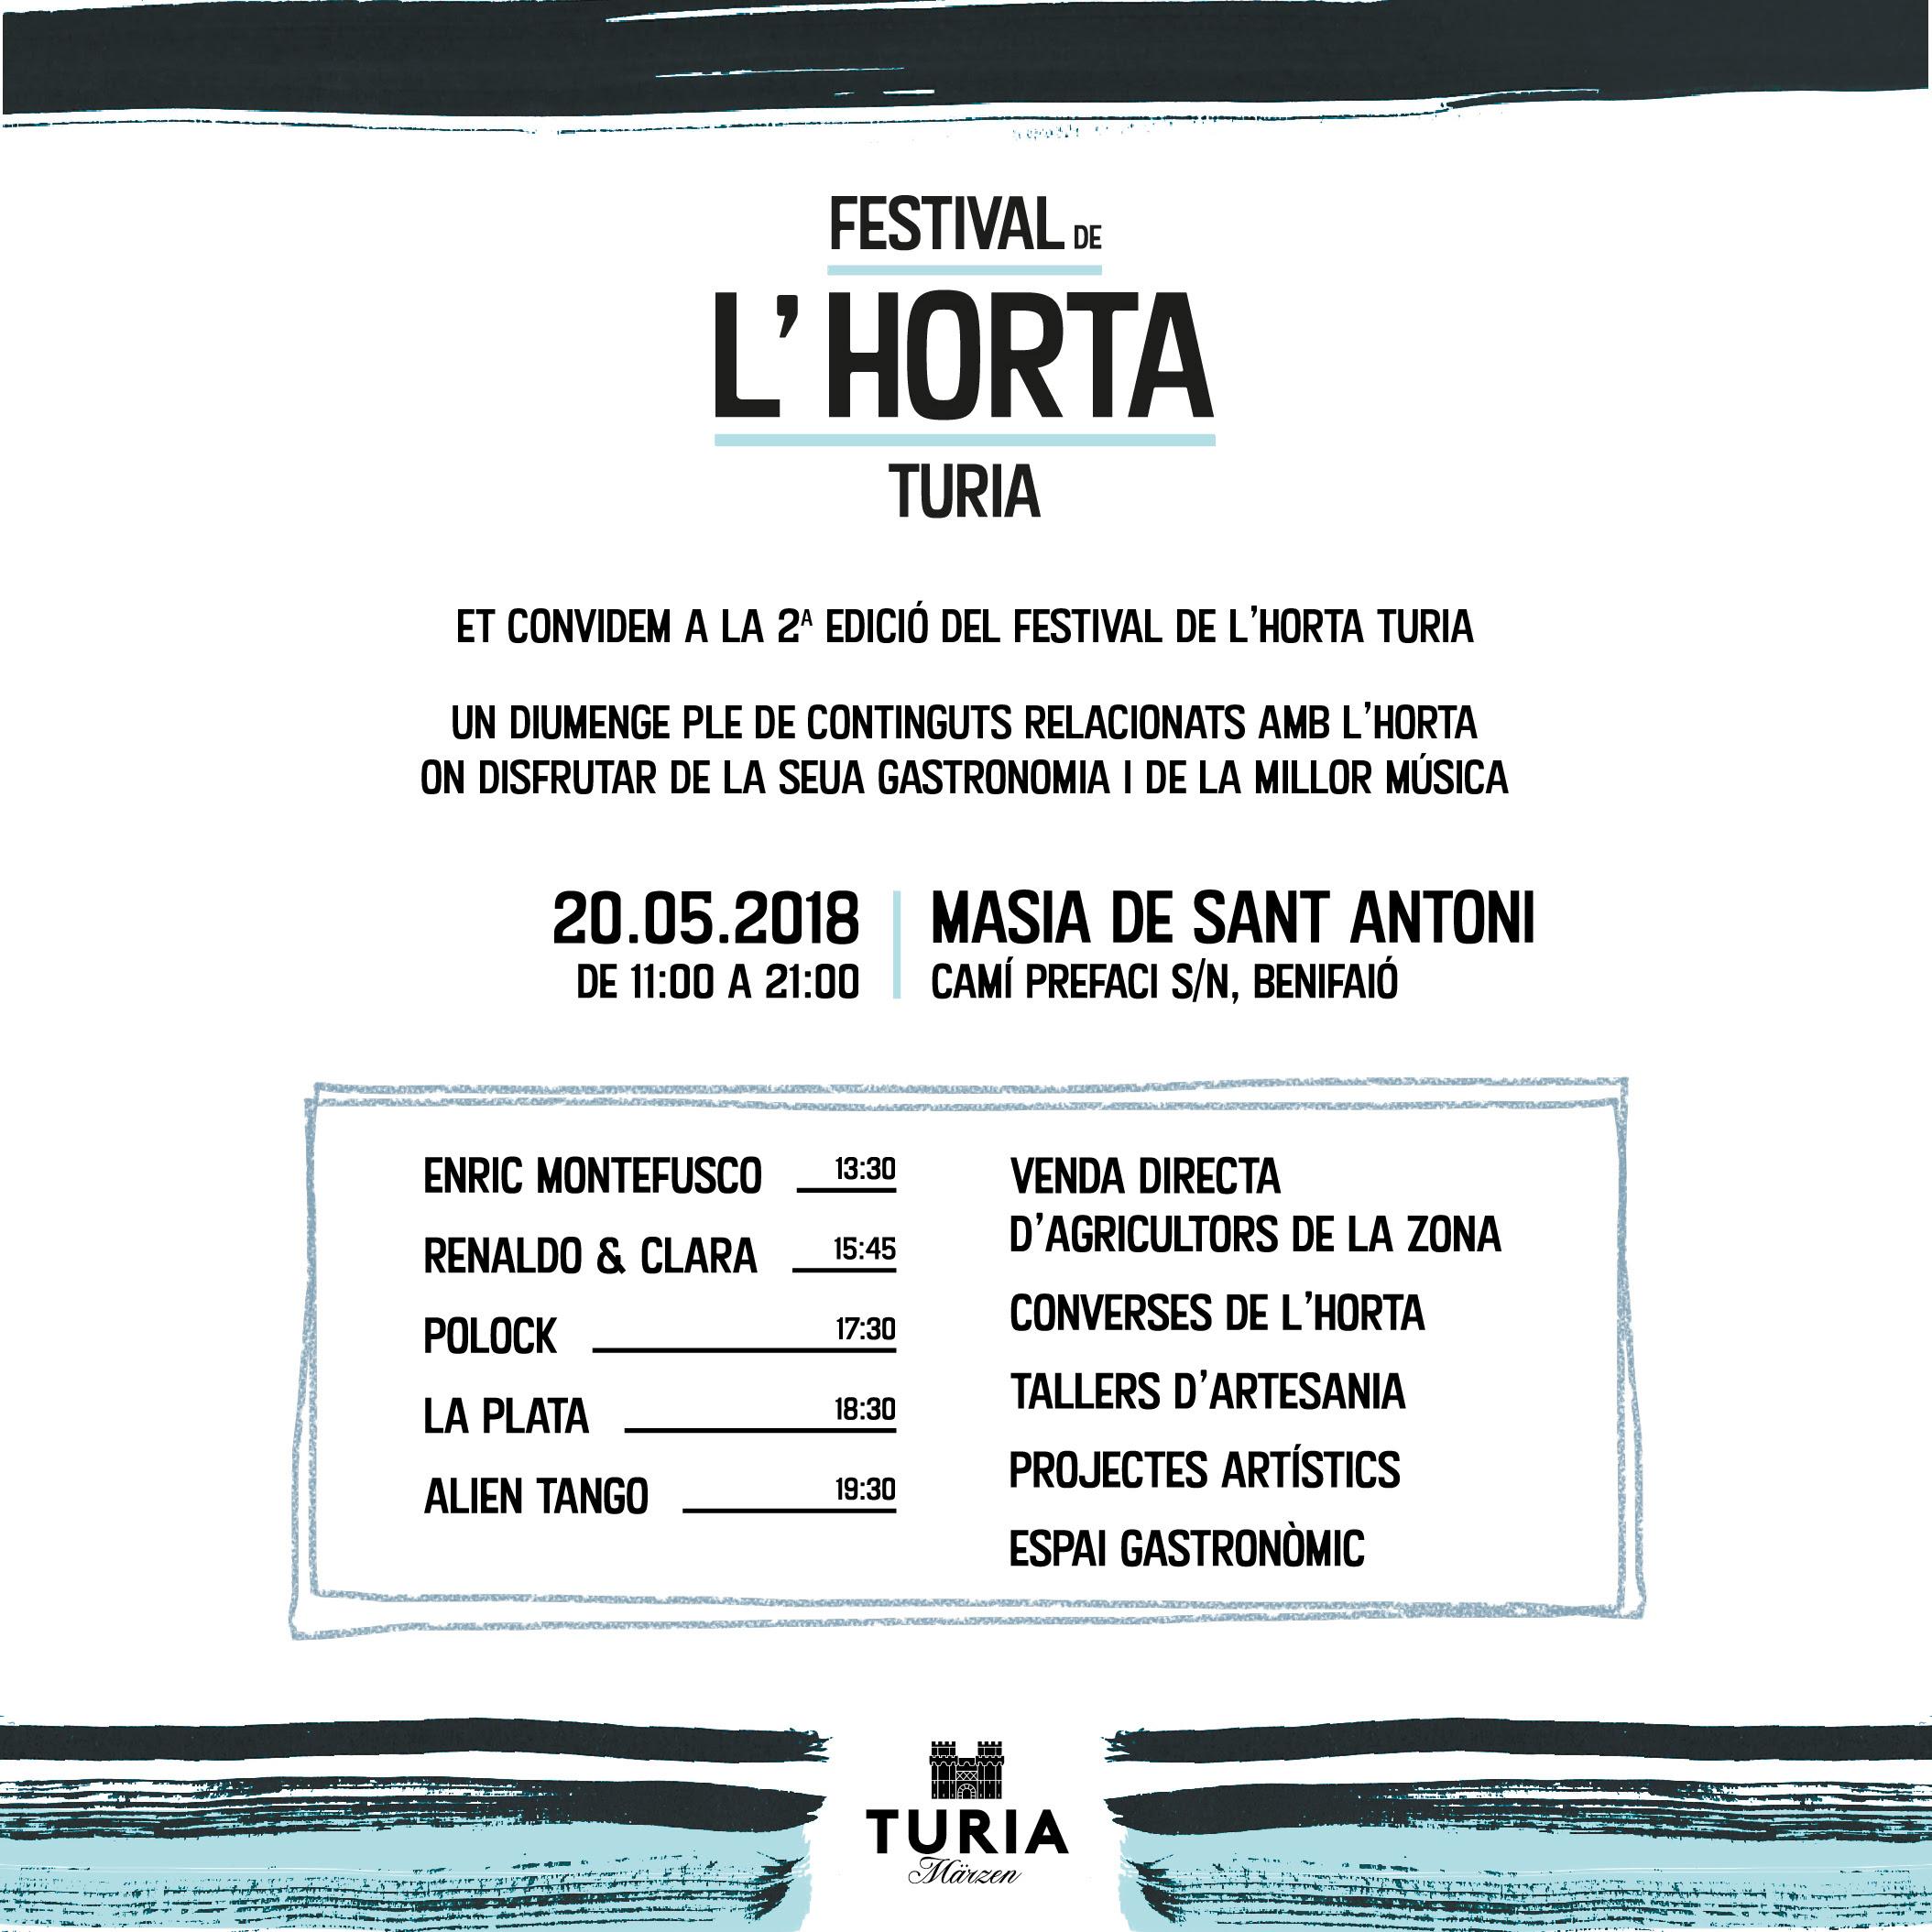 Festival de l'horta Turia PGM.lecoolvalencia